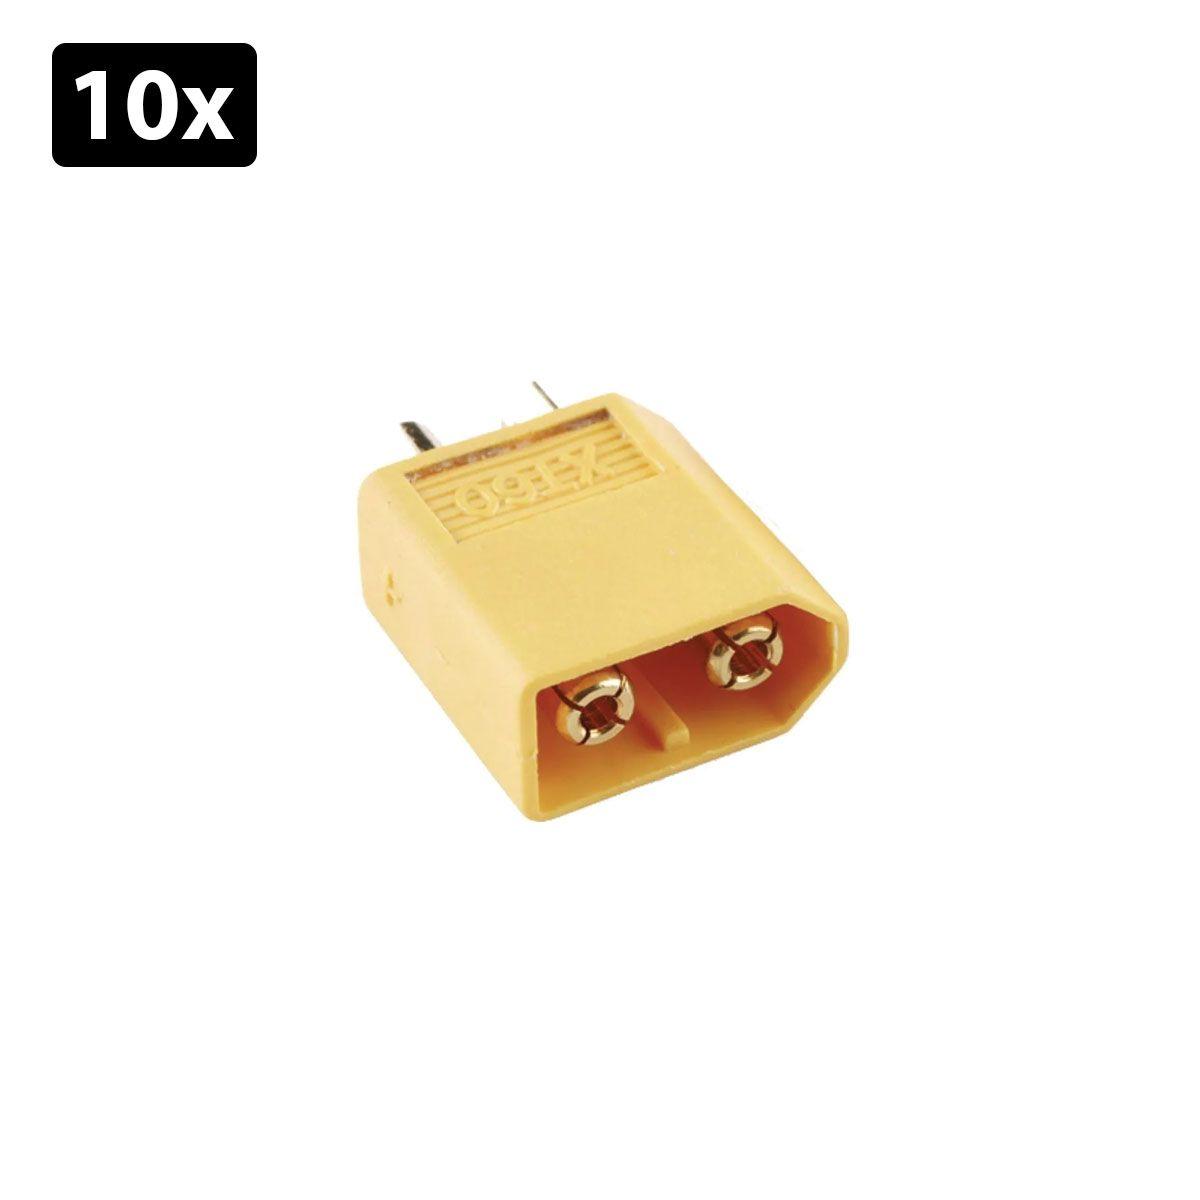 Kit com 10x Conector XT 60 Macho | Conector Lipo